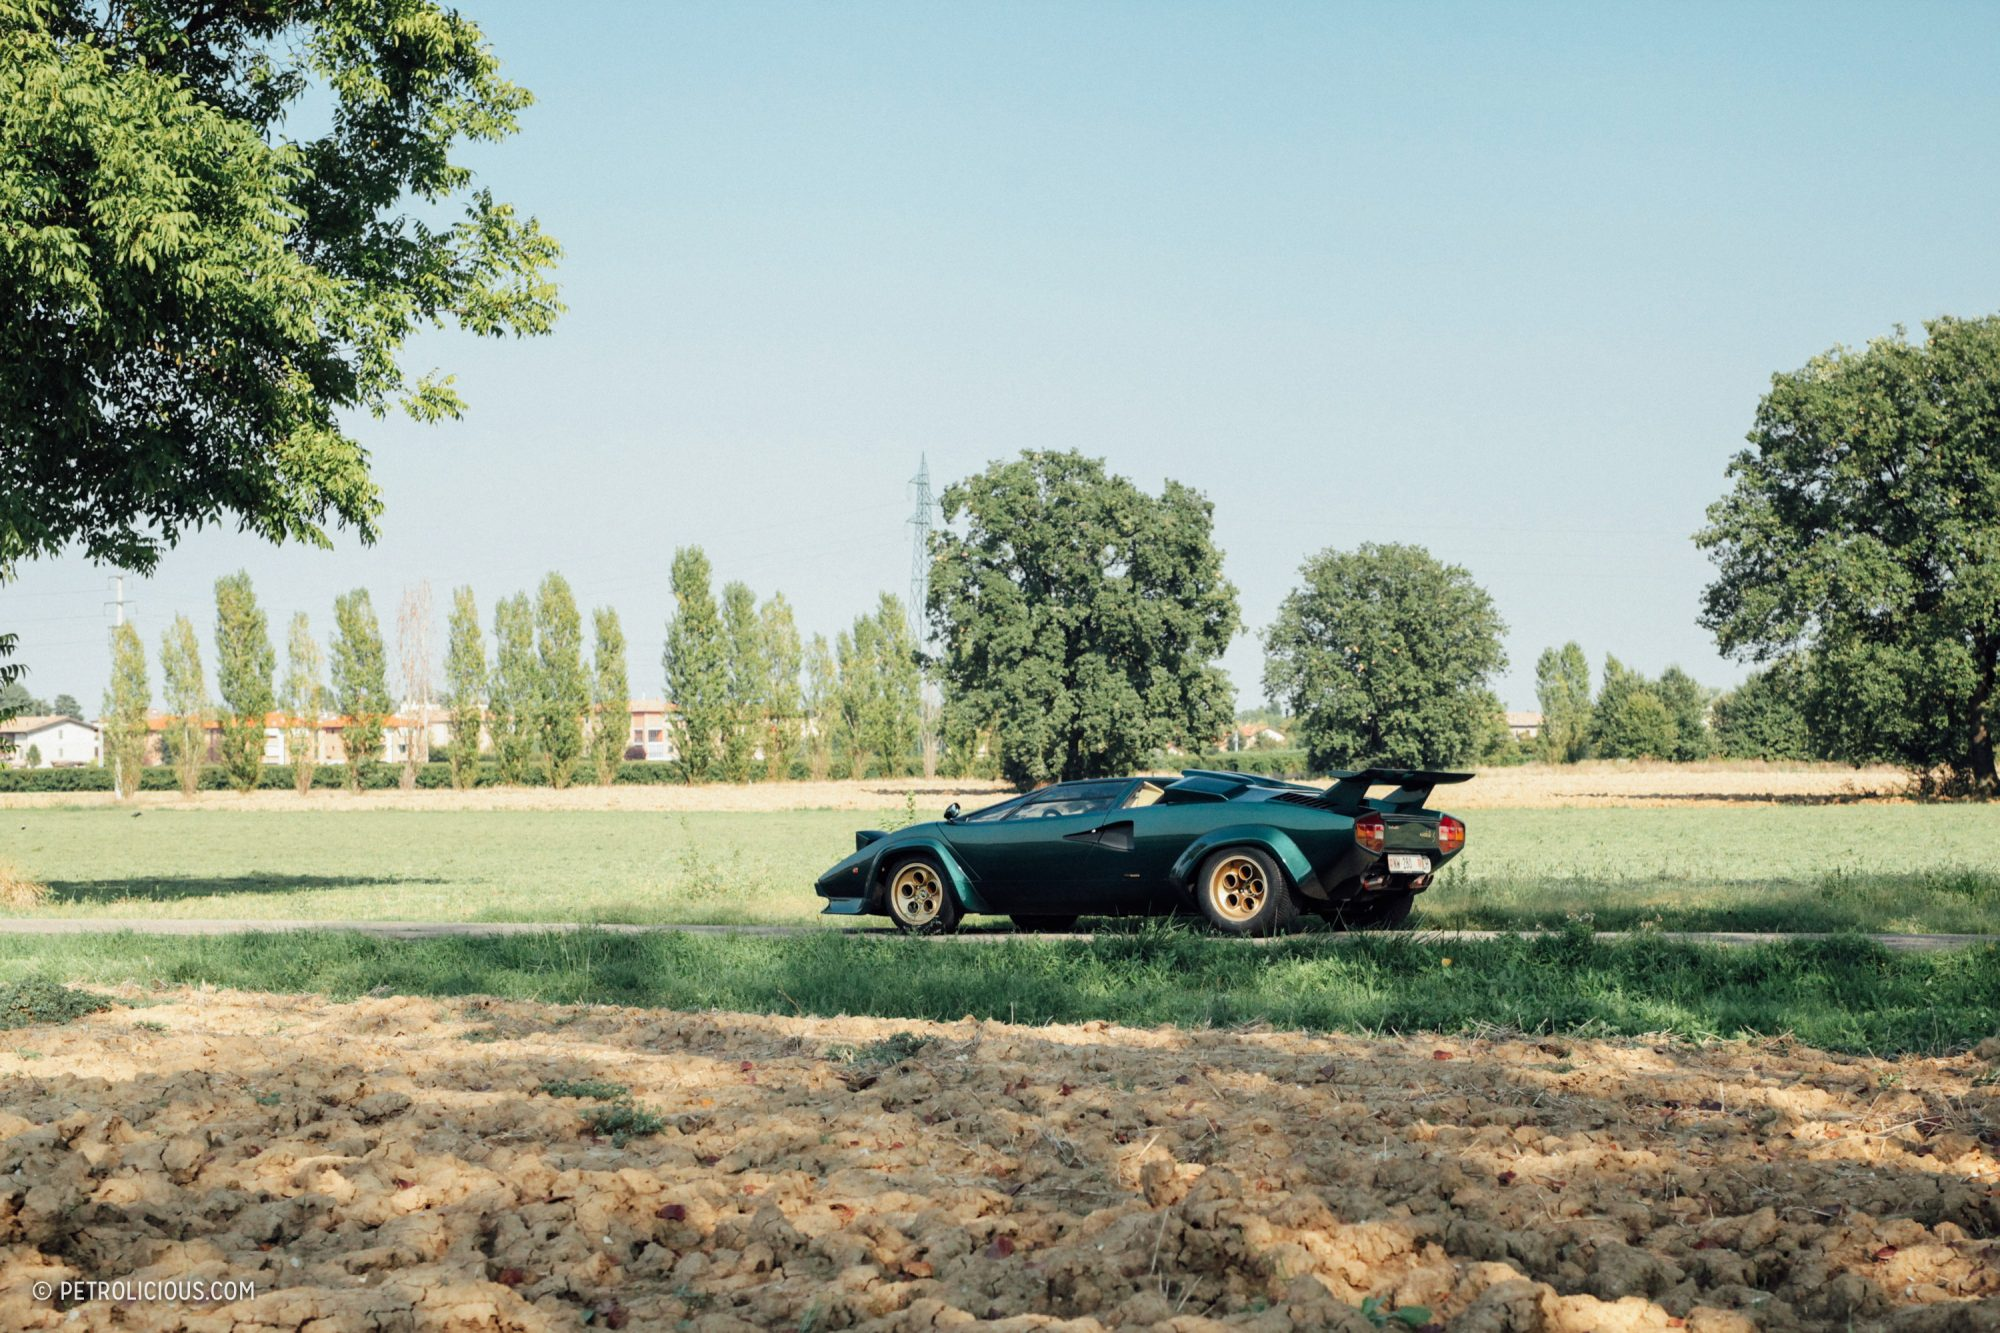 Marco-Annunziata-Lamborghini-Countach-LP400S-Verde-Pino-21-2000x1333